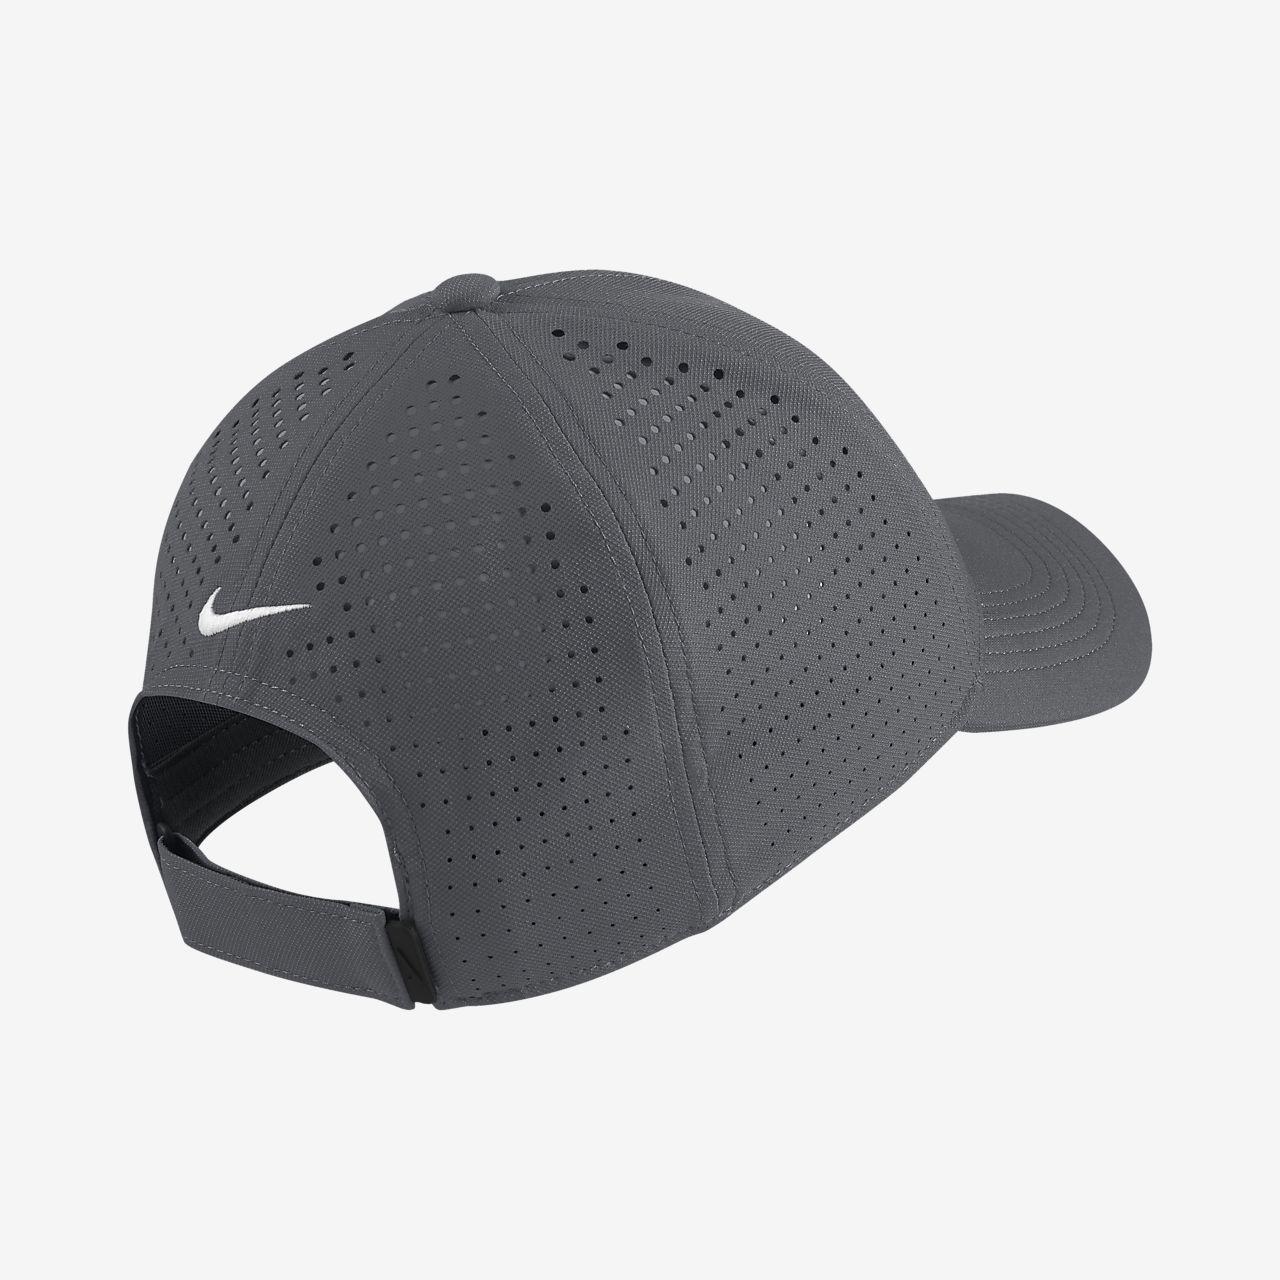 ... Nike Legacy 91 Perforated Adjustable Golf Hat